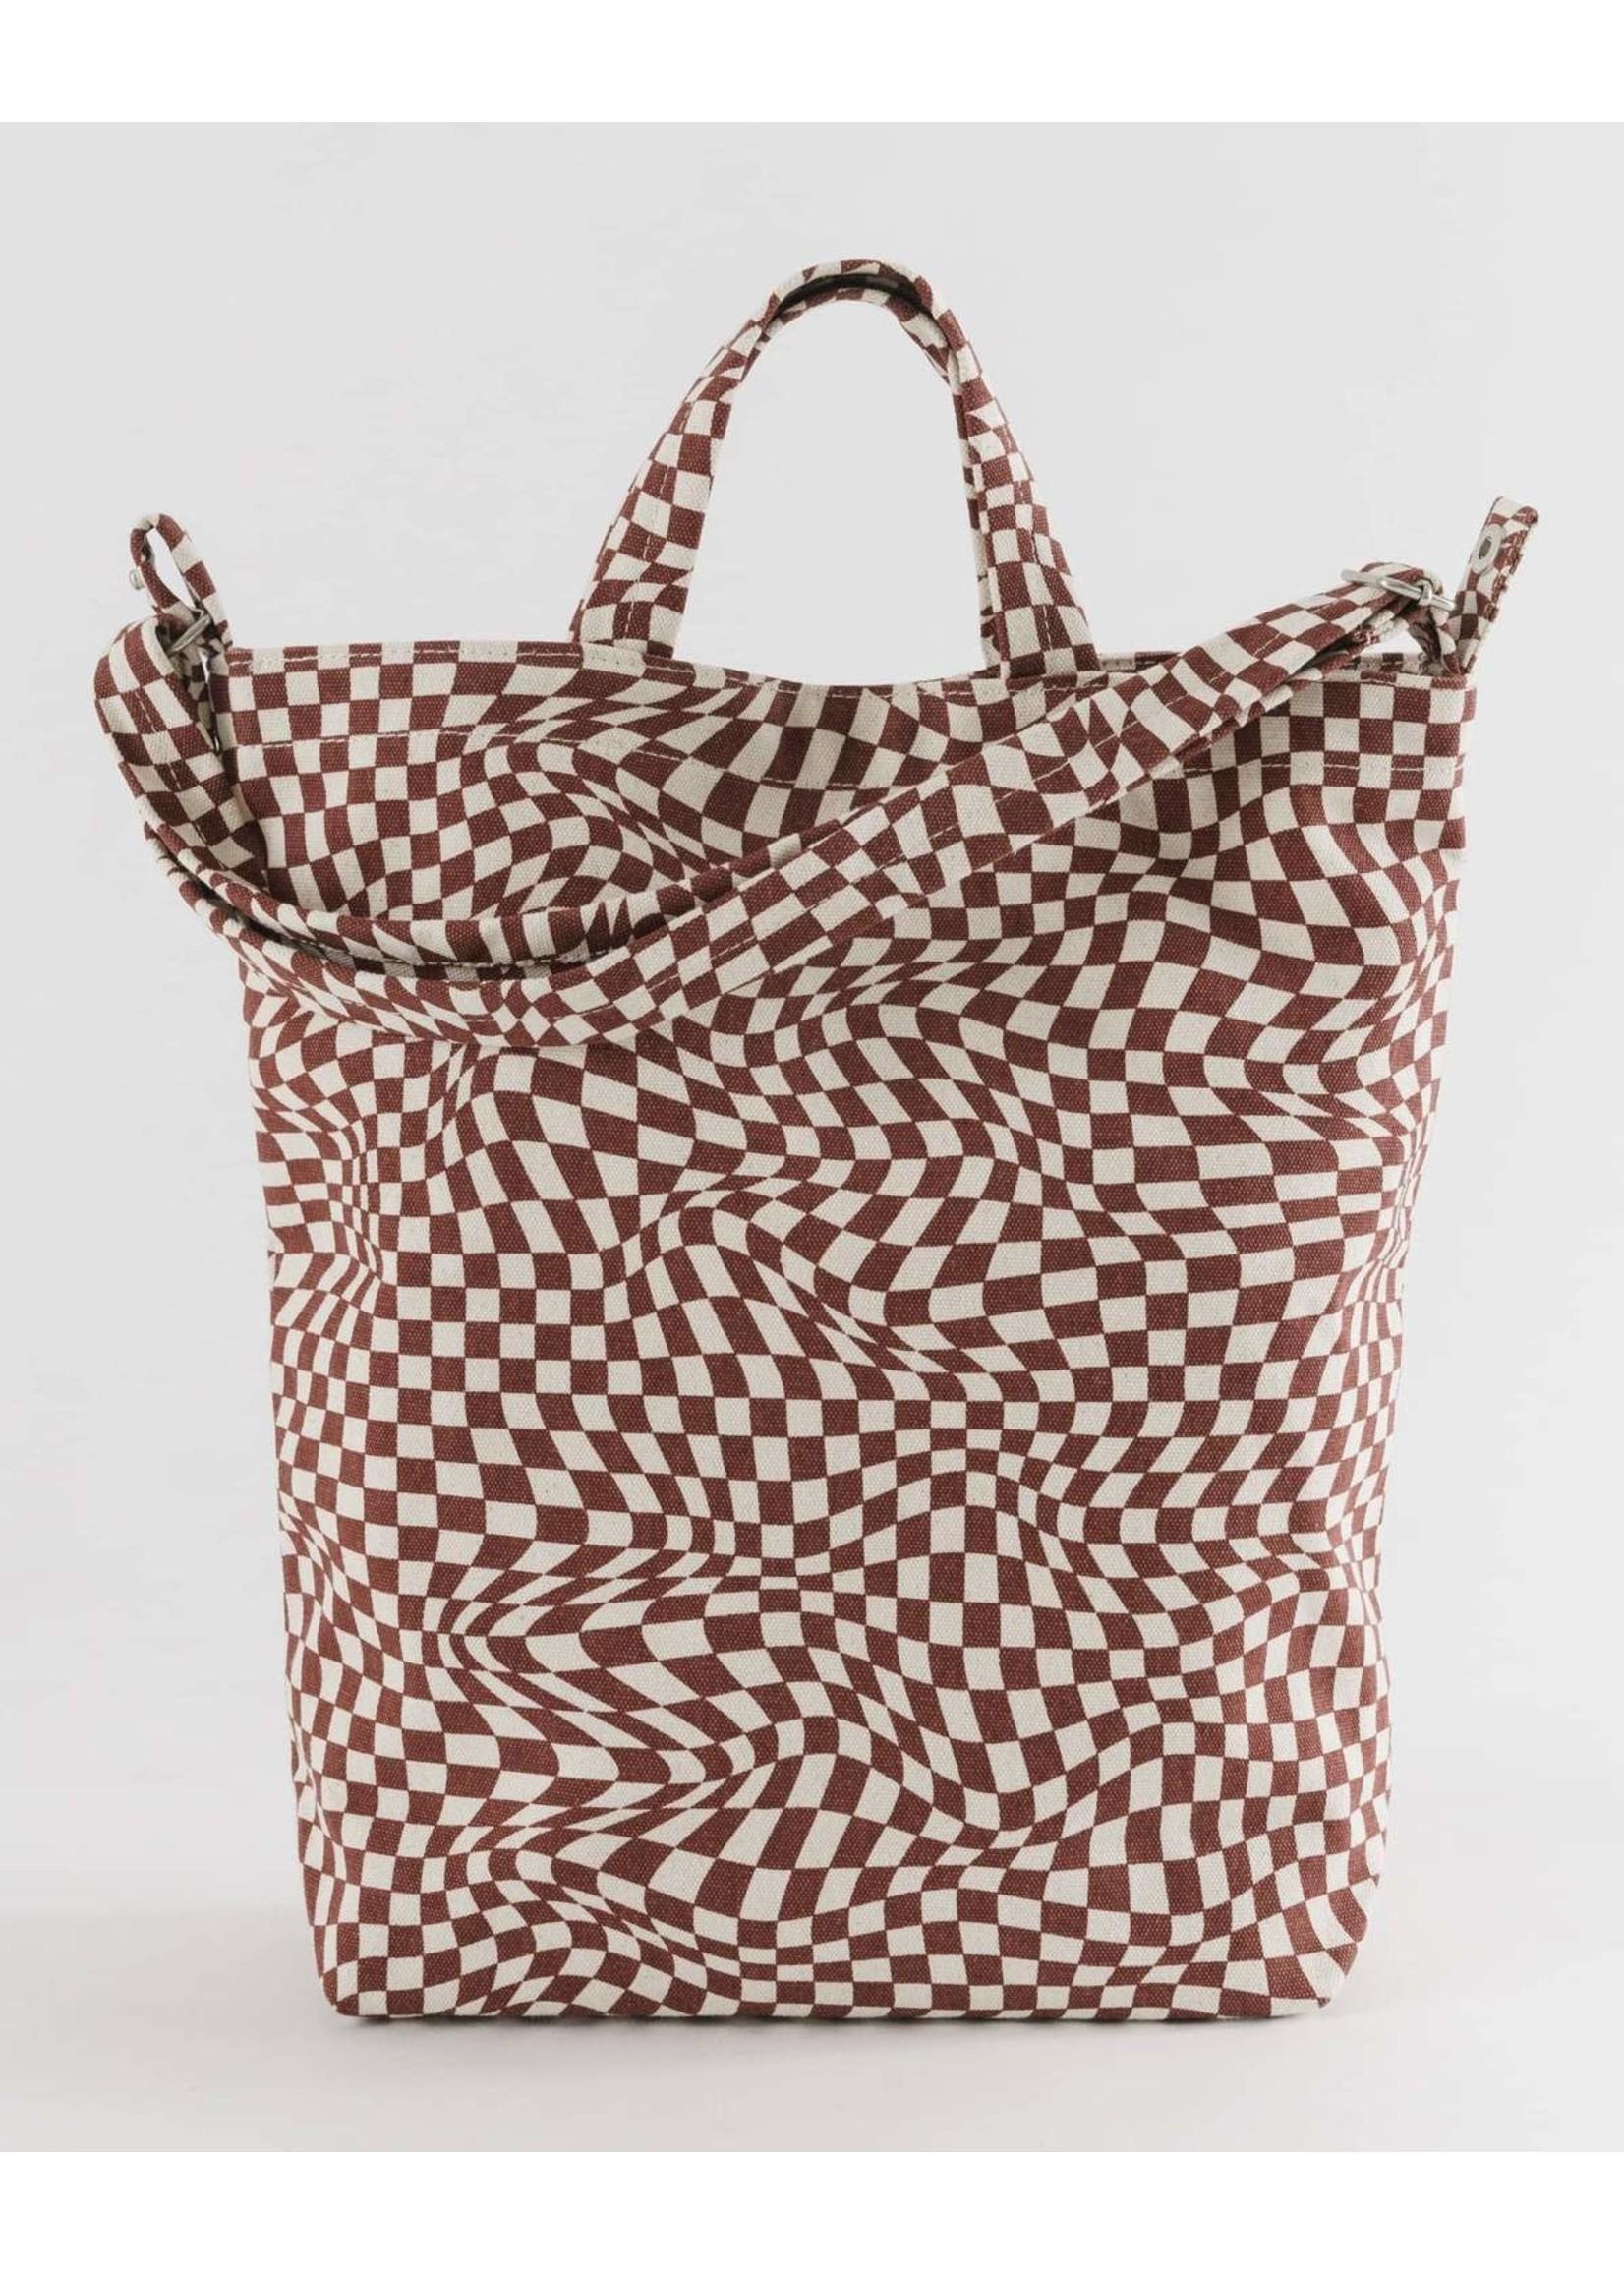 Baggu Baggu Duck Canvas Bag - Maroon Trippy Checker